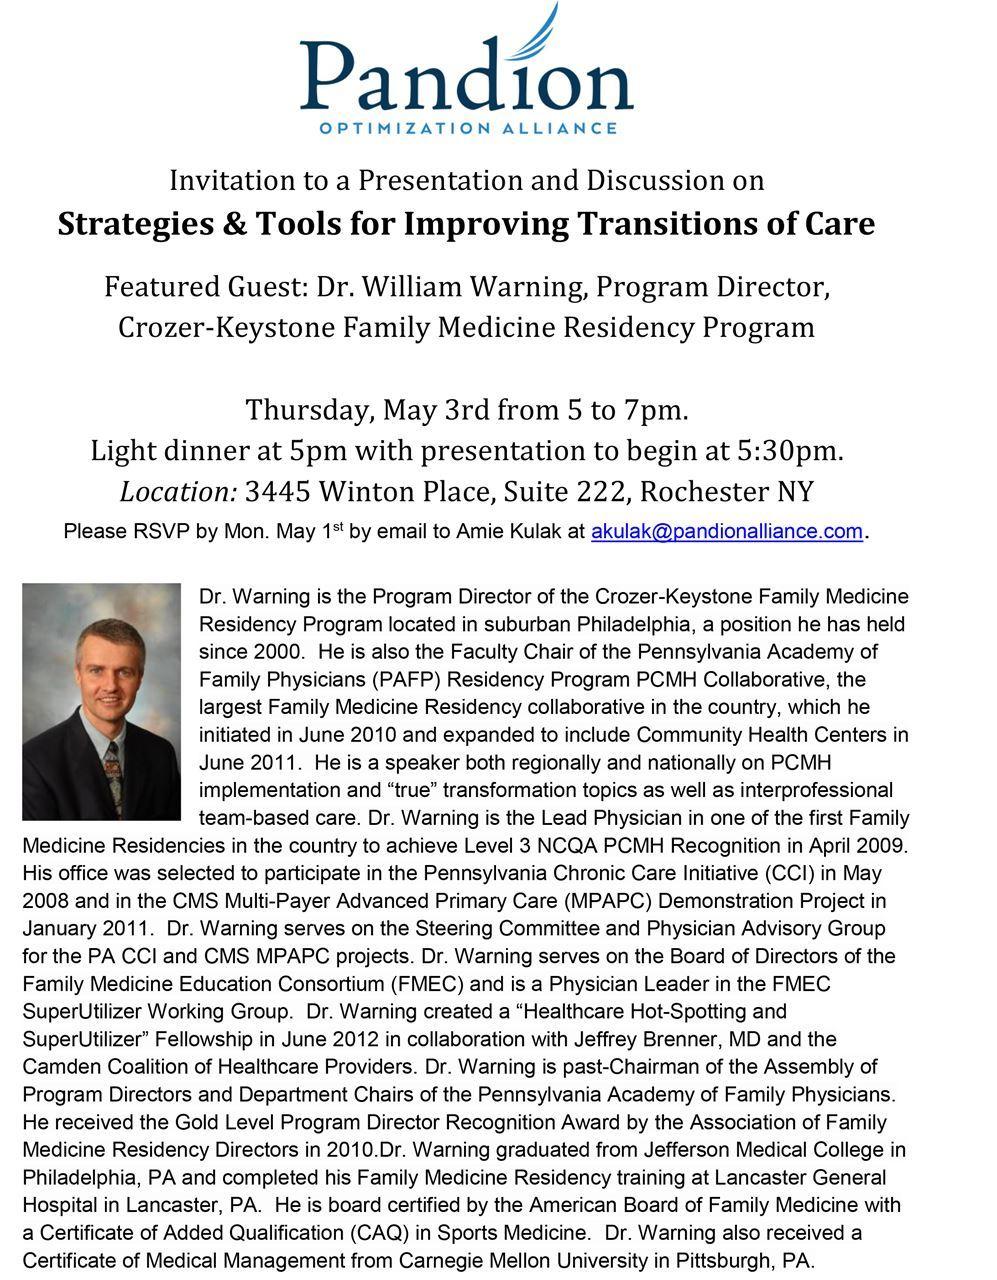 Monroe County Medical Society Bulletin Board